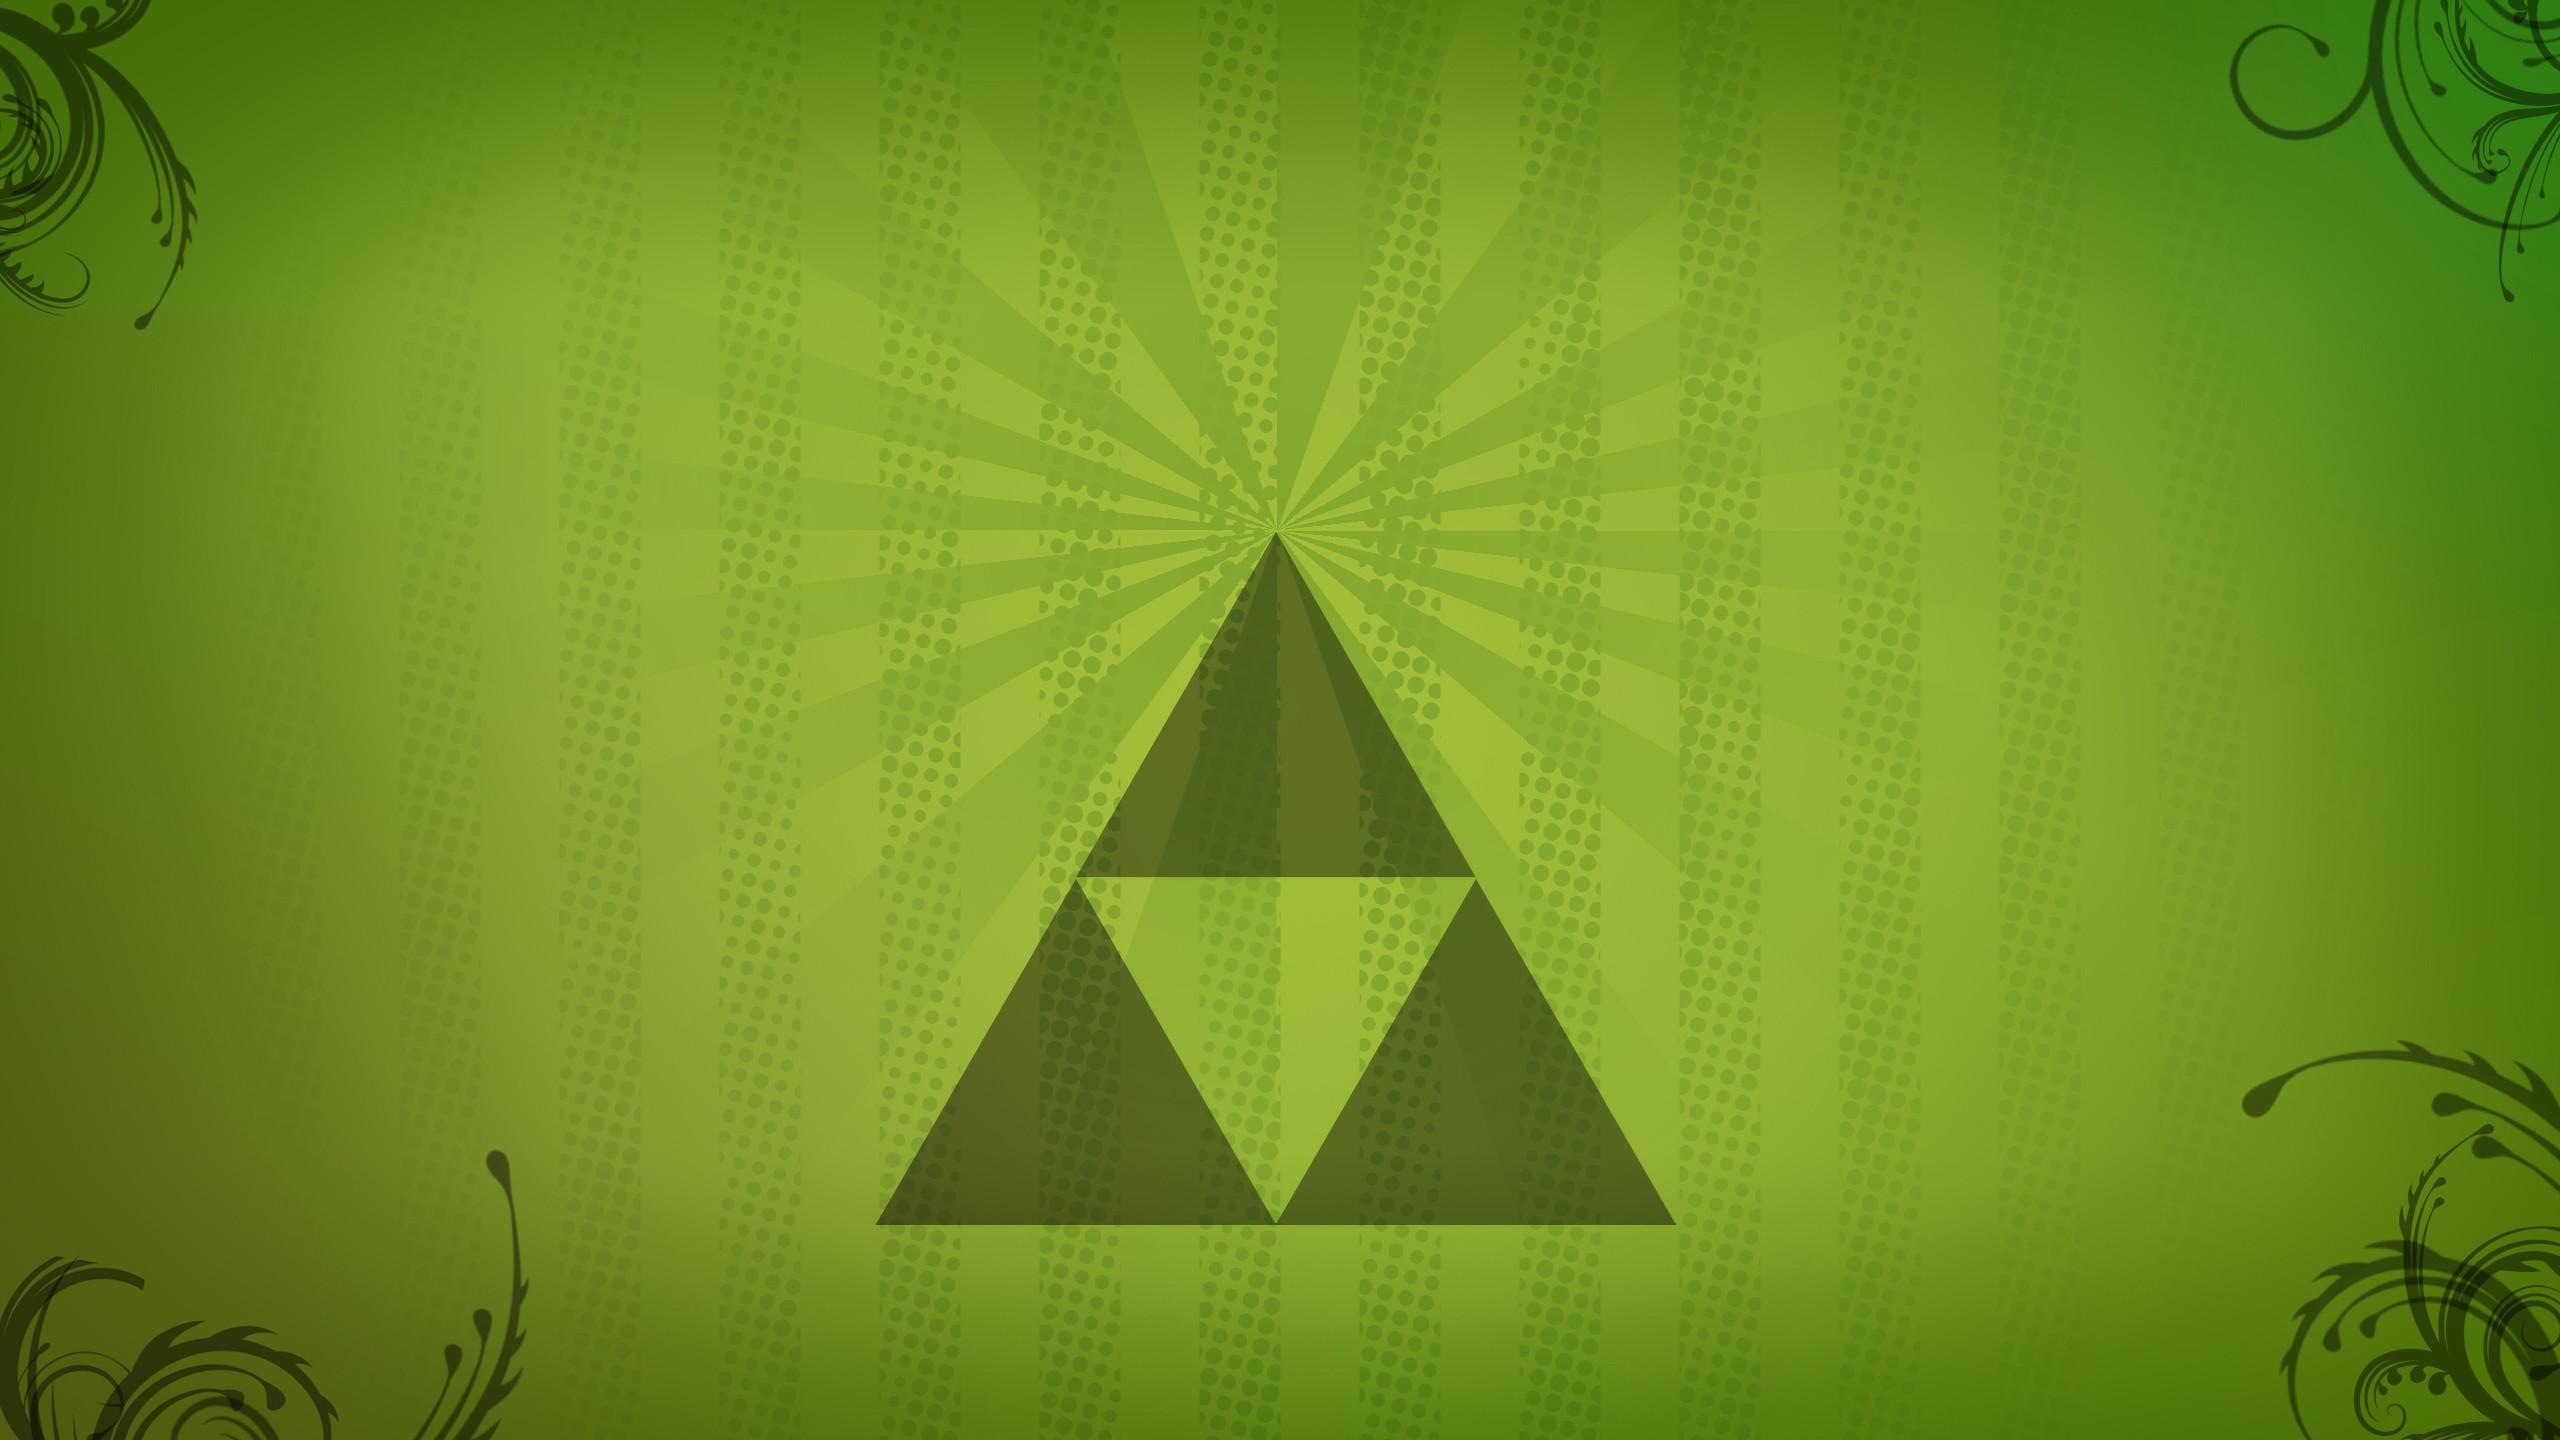 … Zelda Triforce wallpaper – minimalistic by H-Thomson